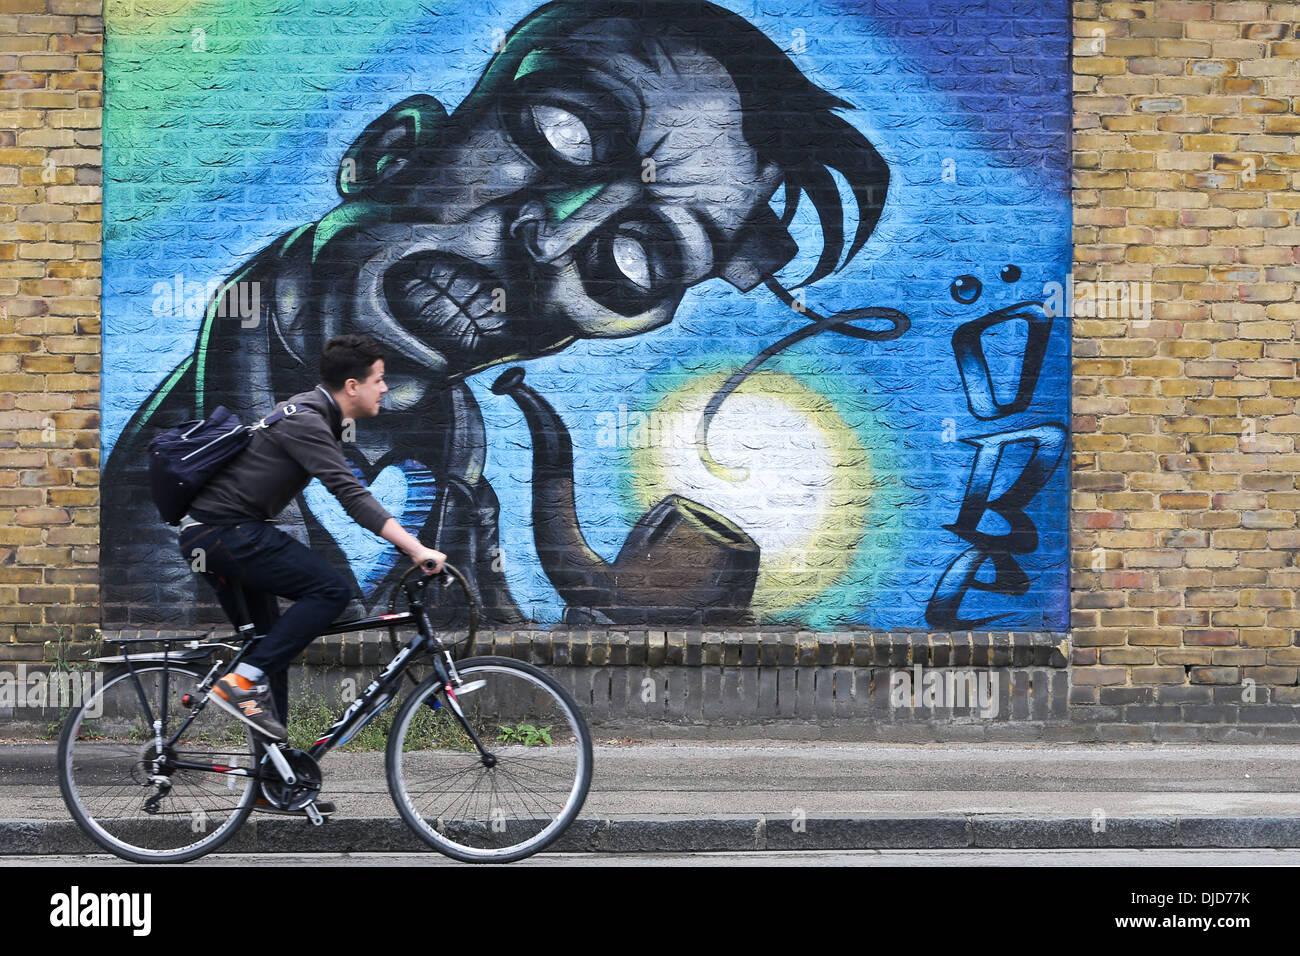 Graffiti wall cambridge - Graffiti On A Wall In Cambridge